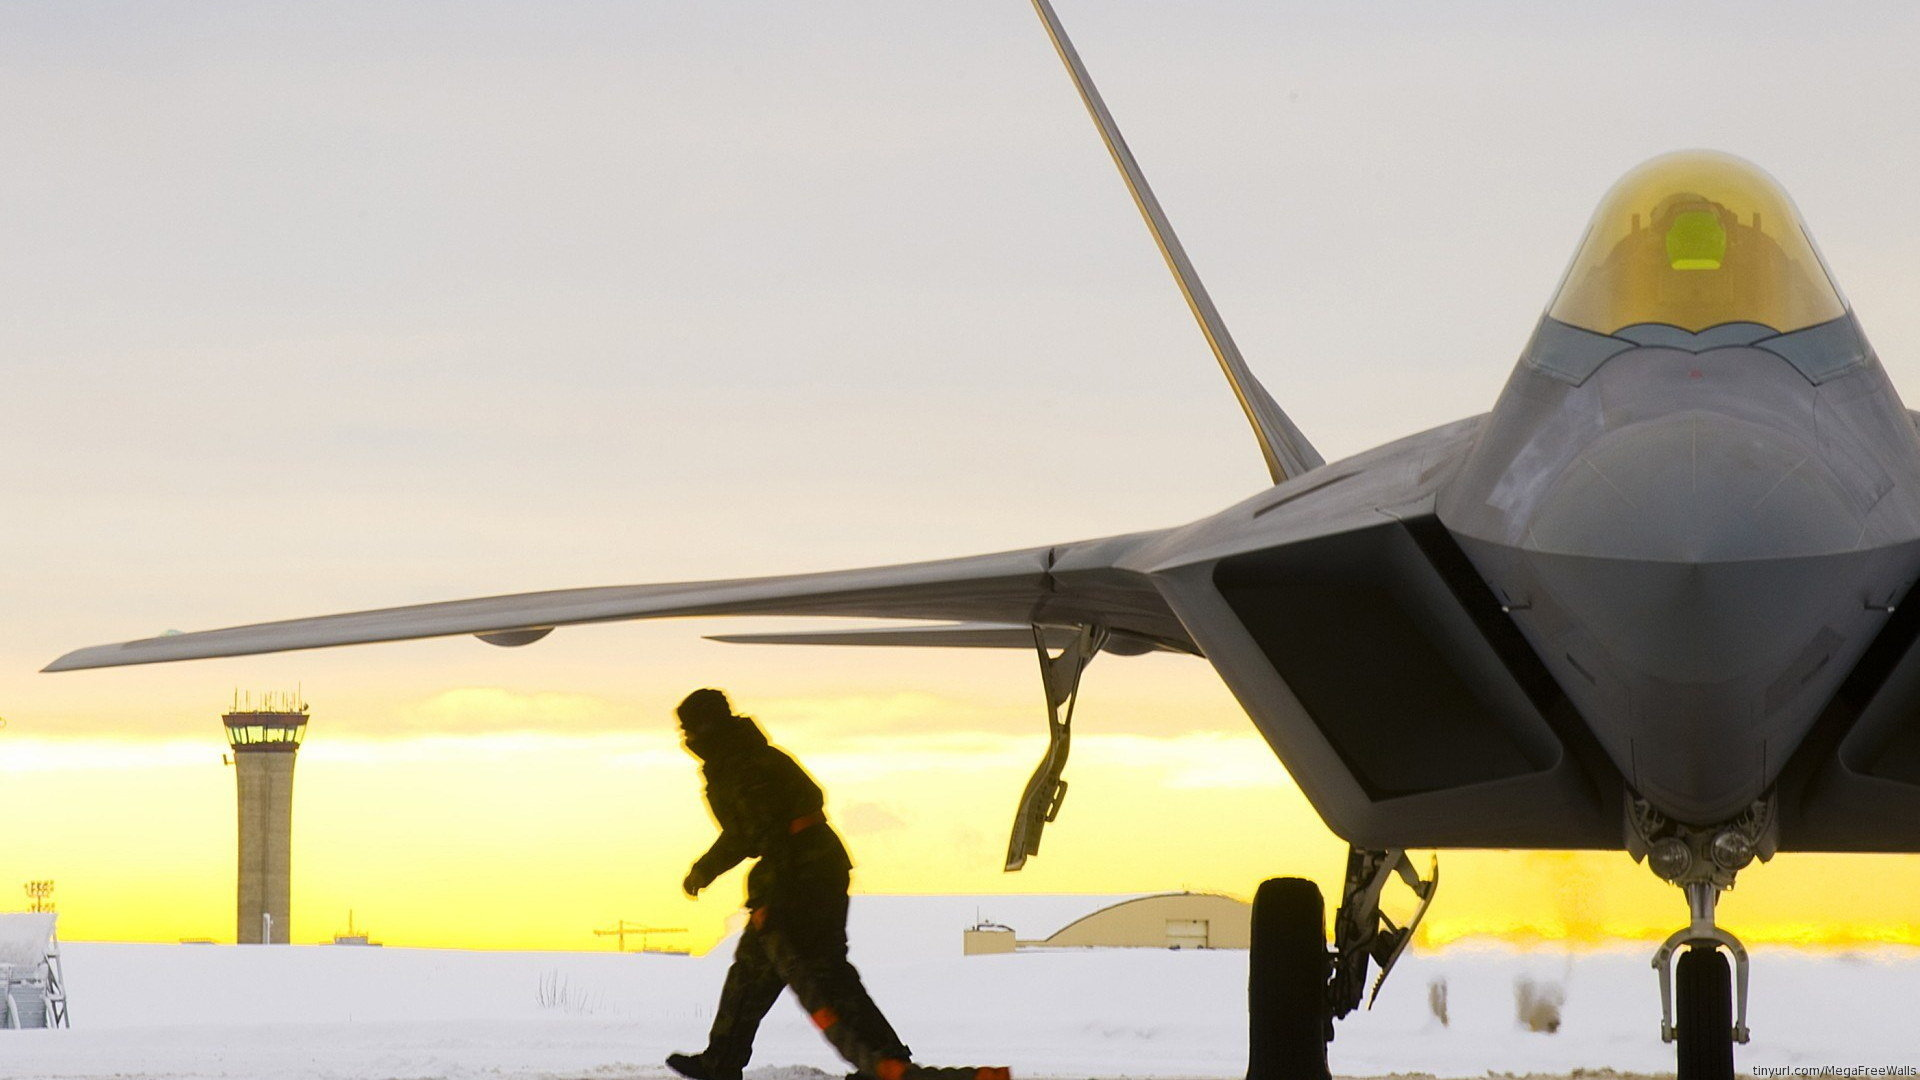 Best Lockheed Martin F 22 Raptor Wallpaper Id 446201 For High